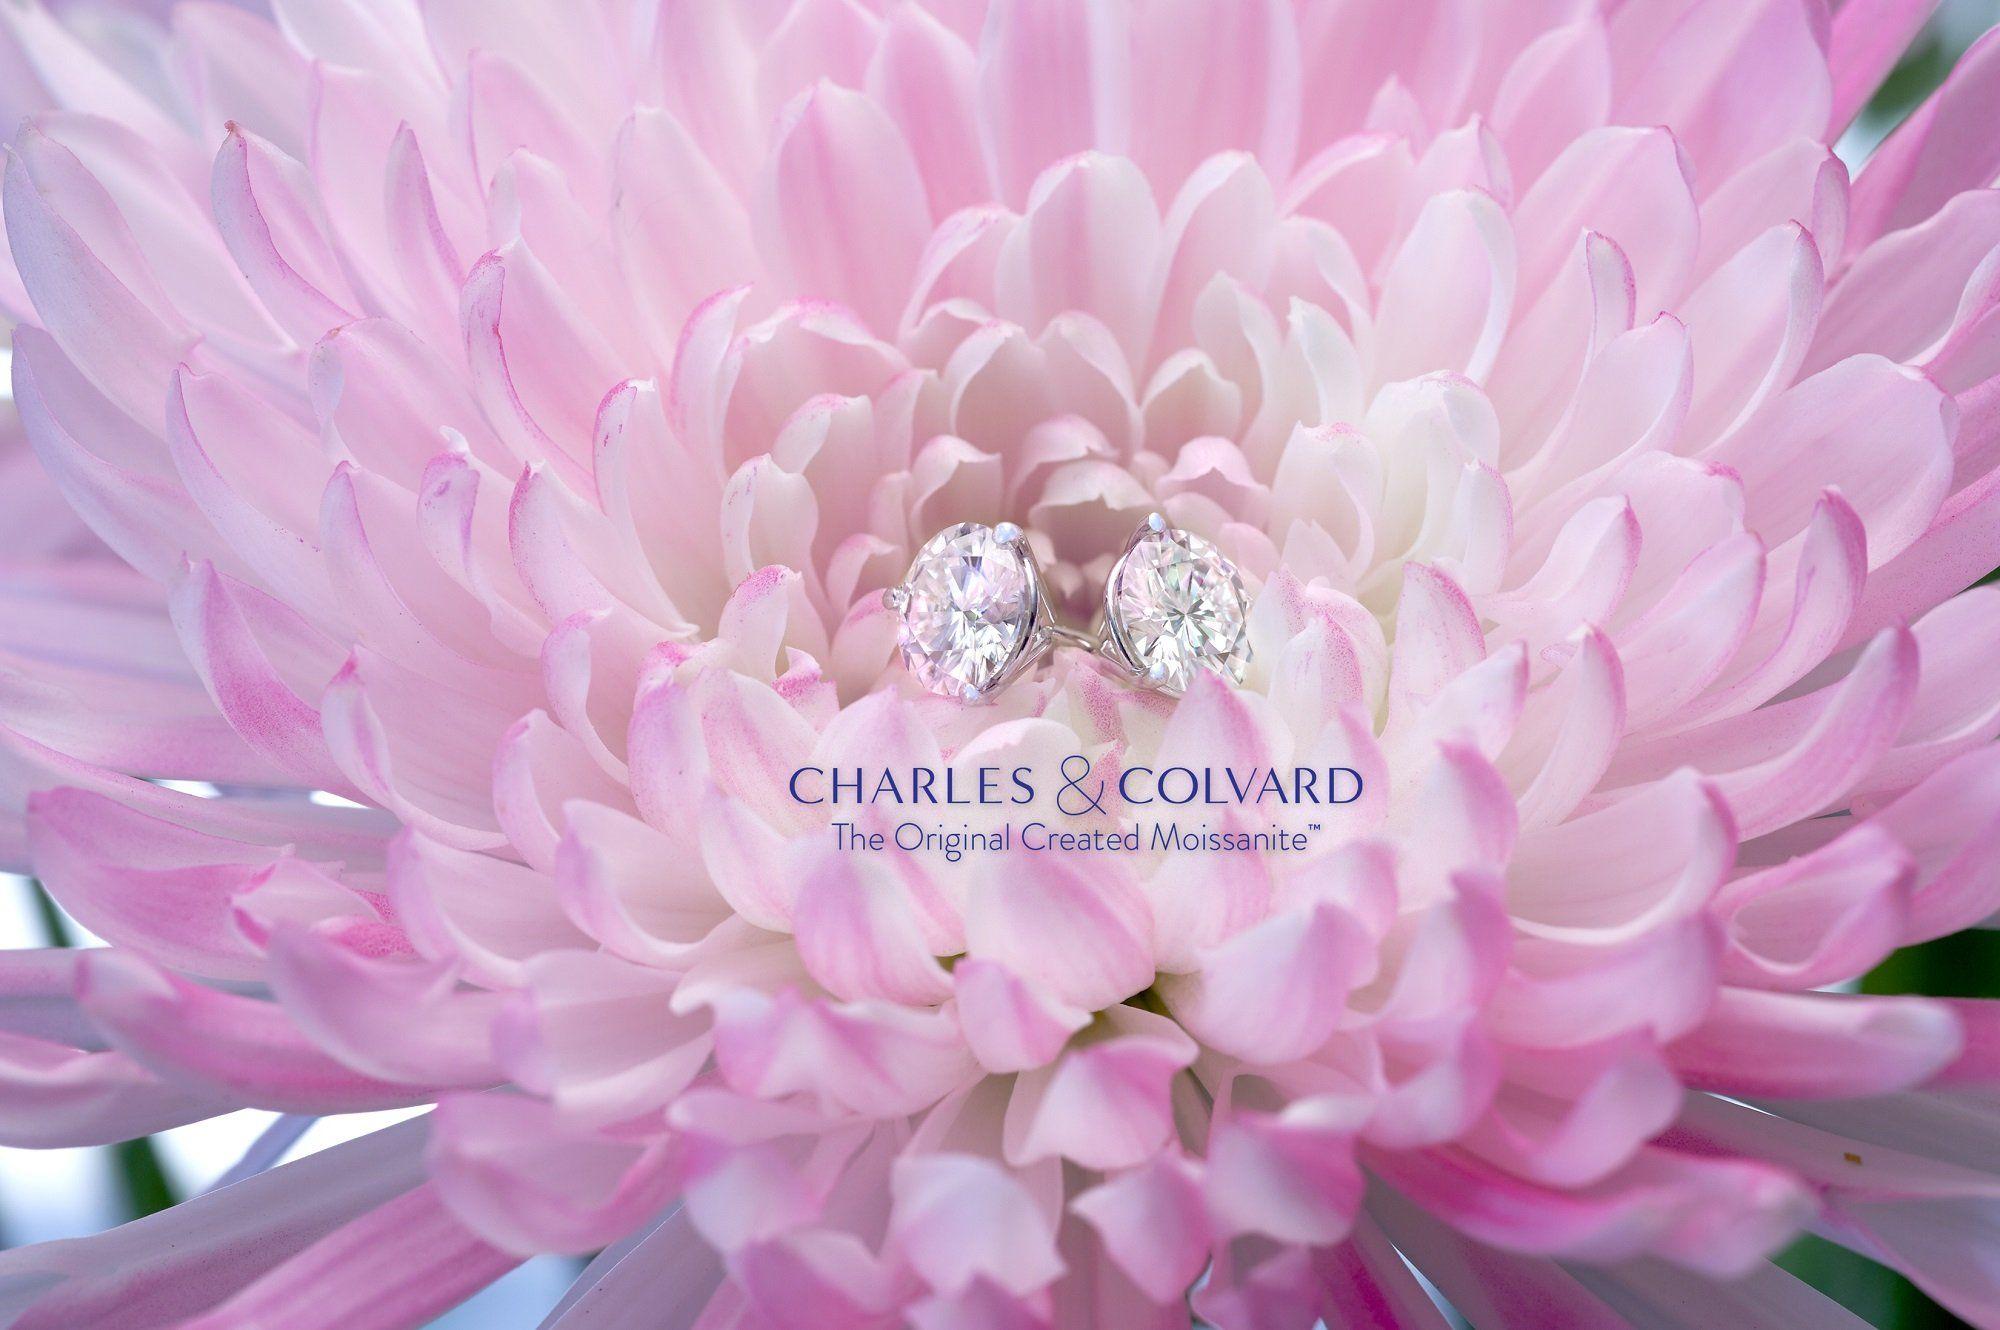 a88b0e5fa Charles & Colvard Forever Classic 6mm 1.60cttw DEW White Created Moissanite  14K White Gold Screw Back Posts Round Martini Stud Earrings #affiliate # diamond